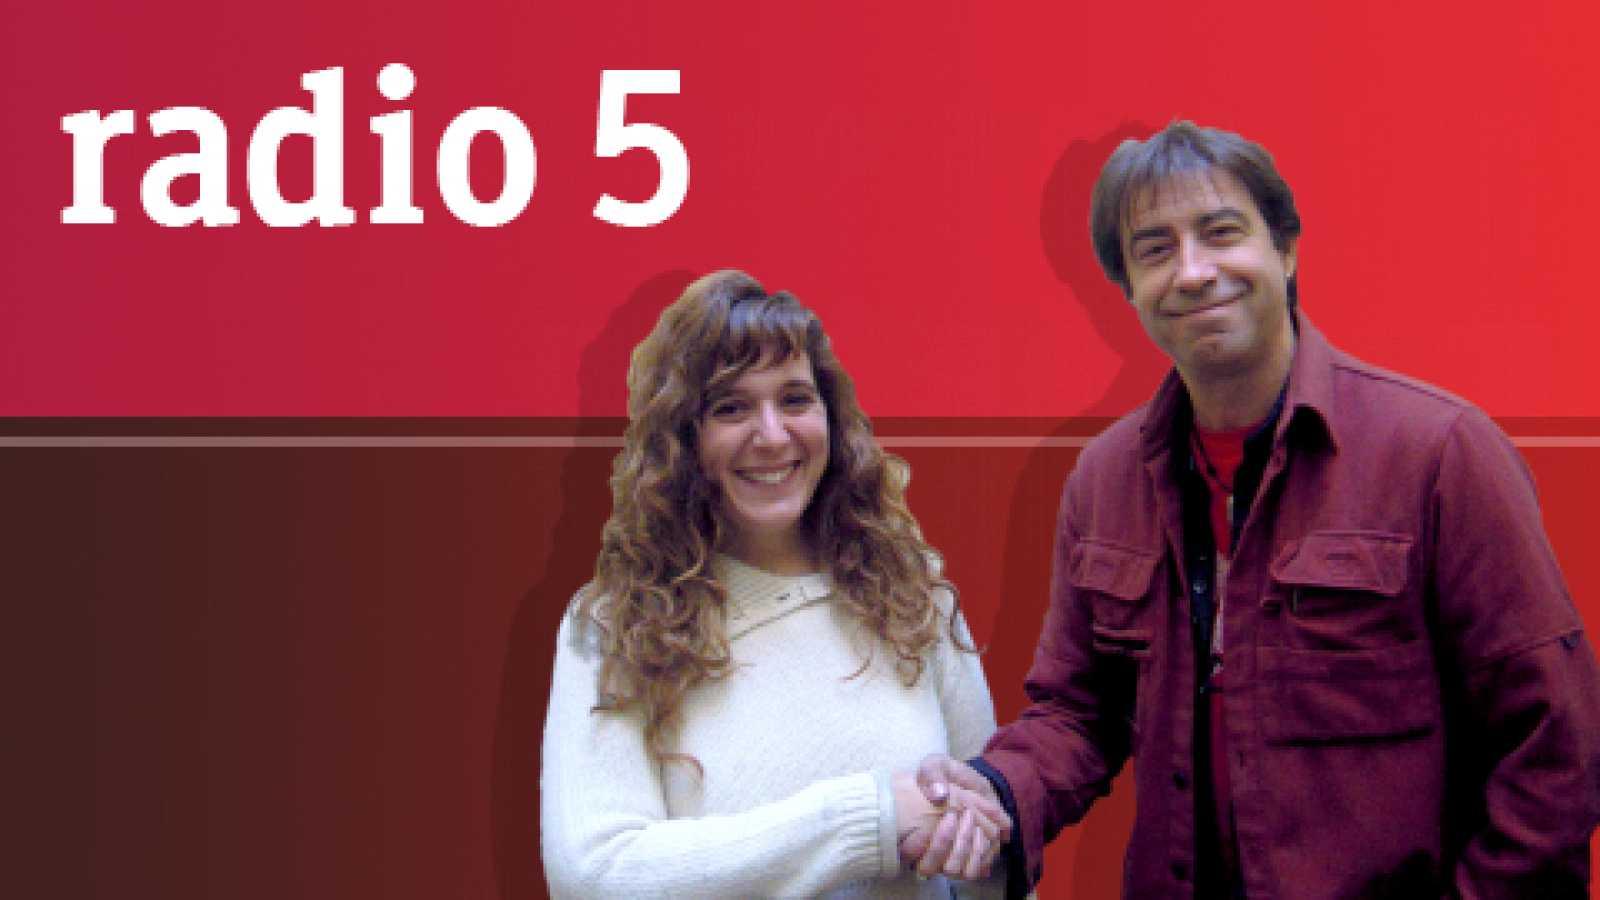 Mediacción - Asociación de vecinos - 27/04/15 - escuchar ahora